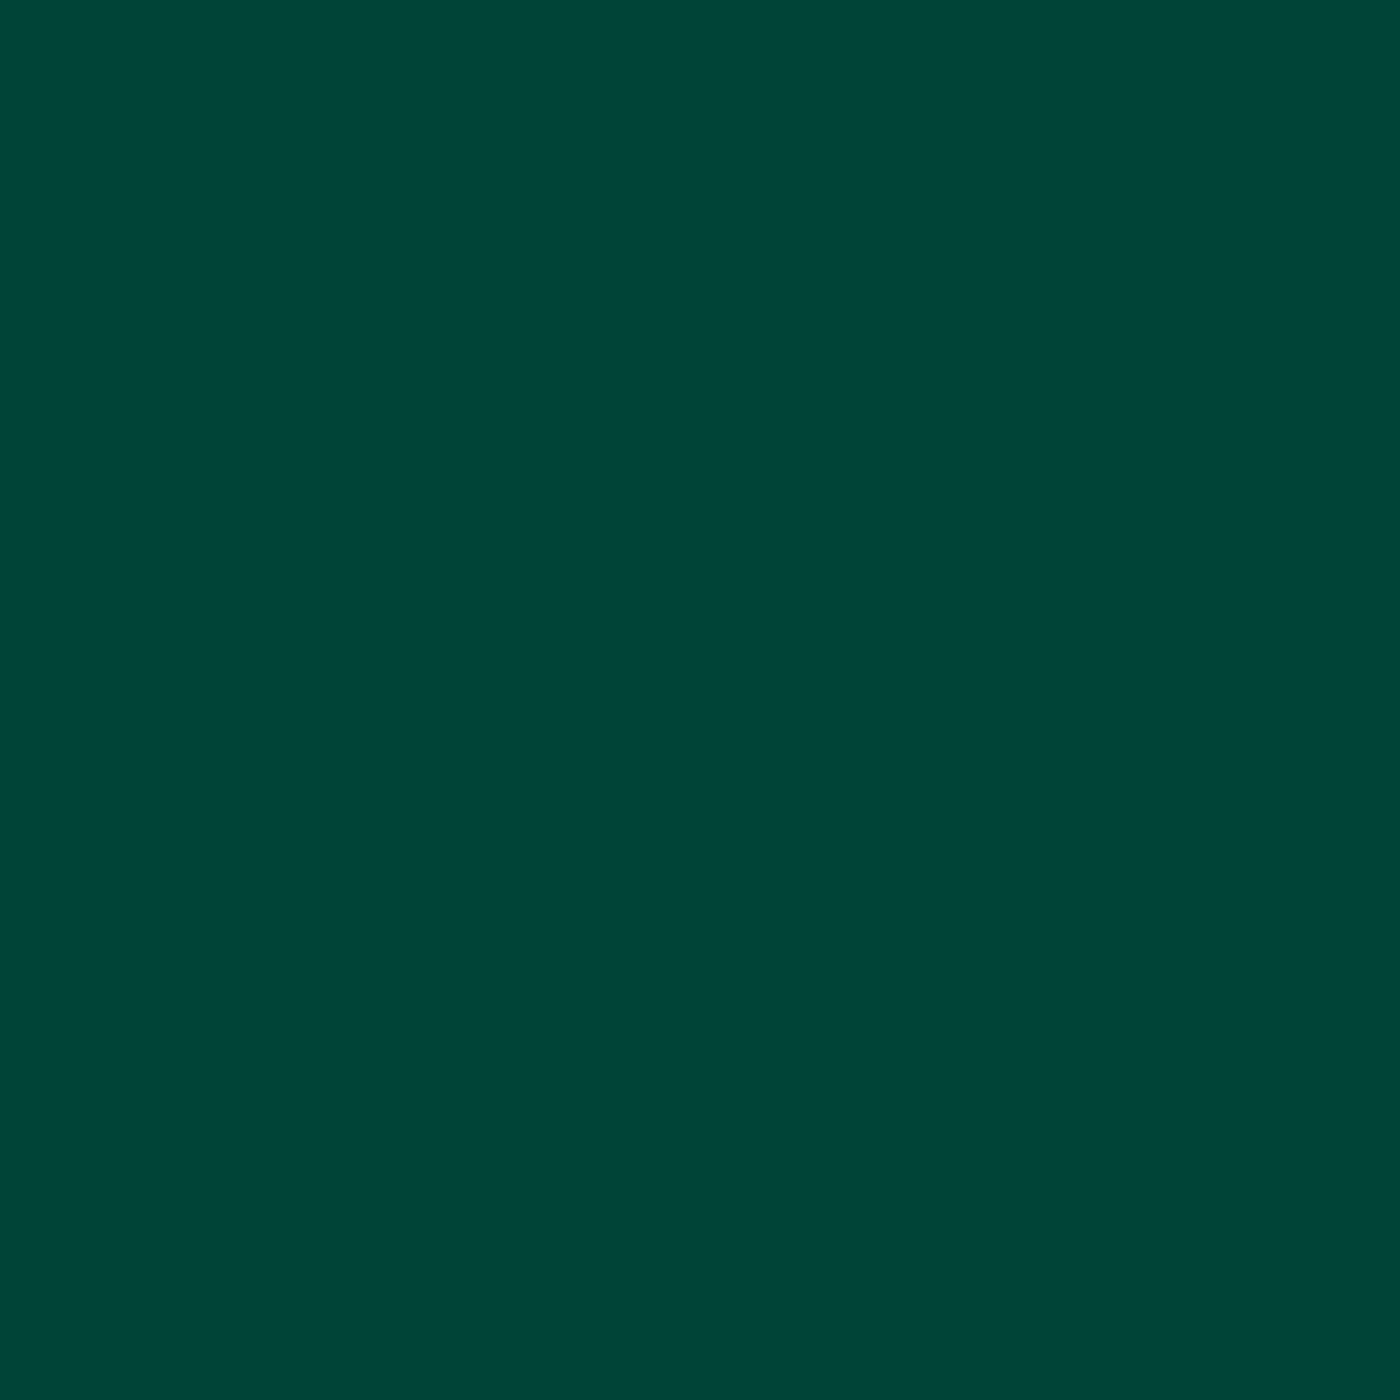 Oracal 651 Vinyl Roll 12'' x 50 yard (150 feet) (Dark Green)